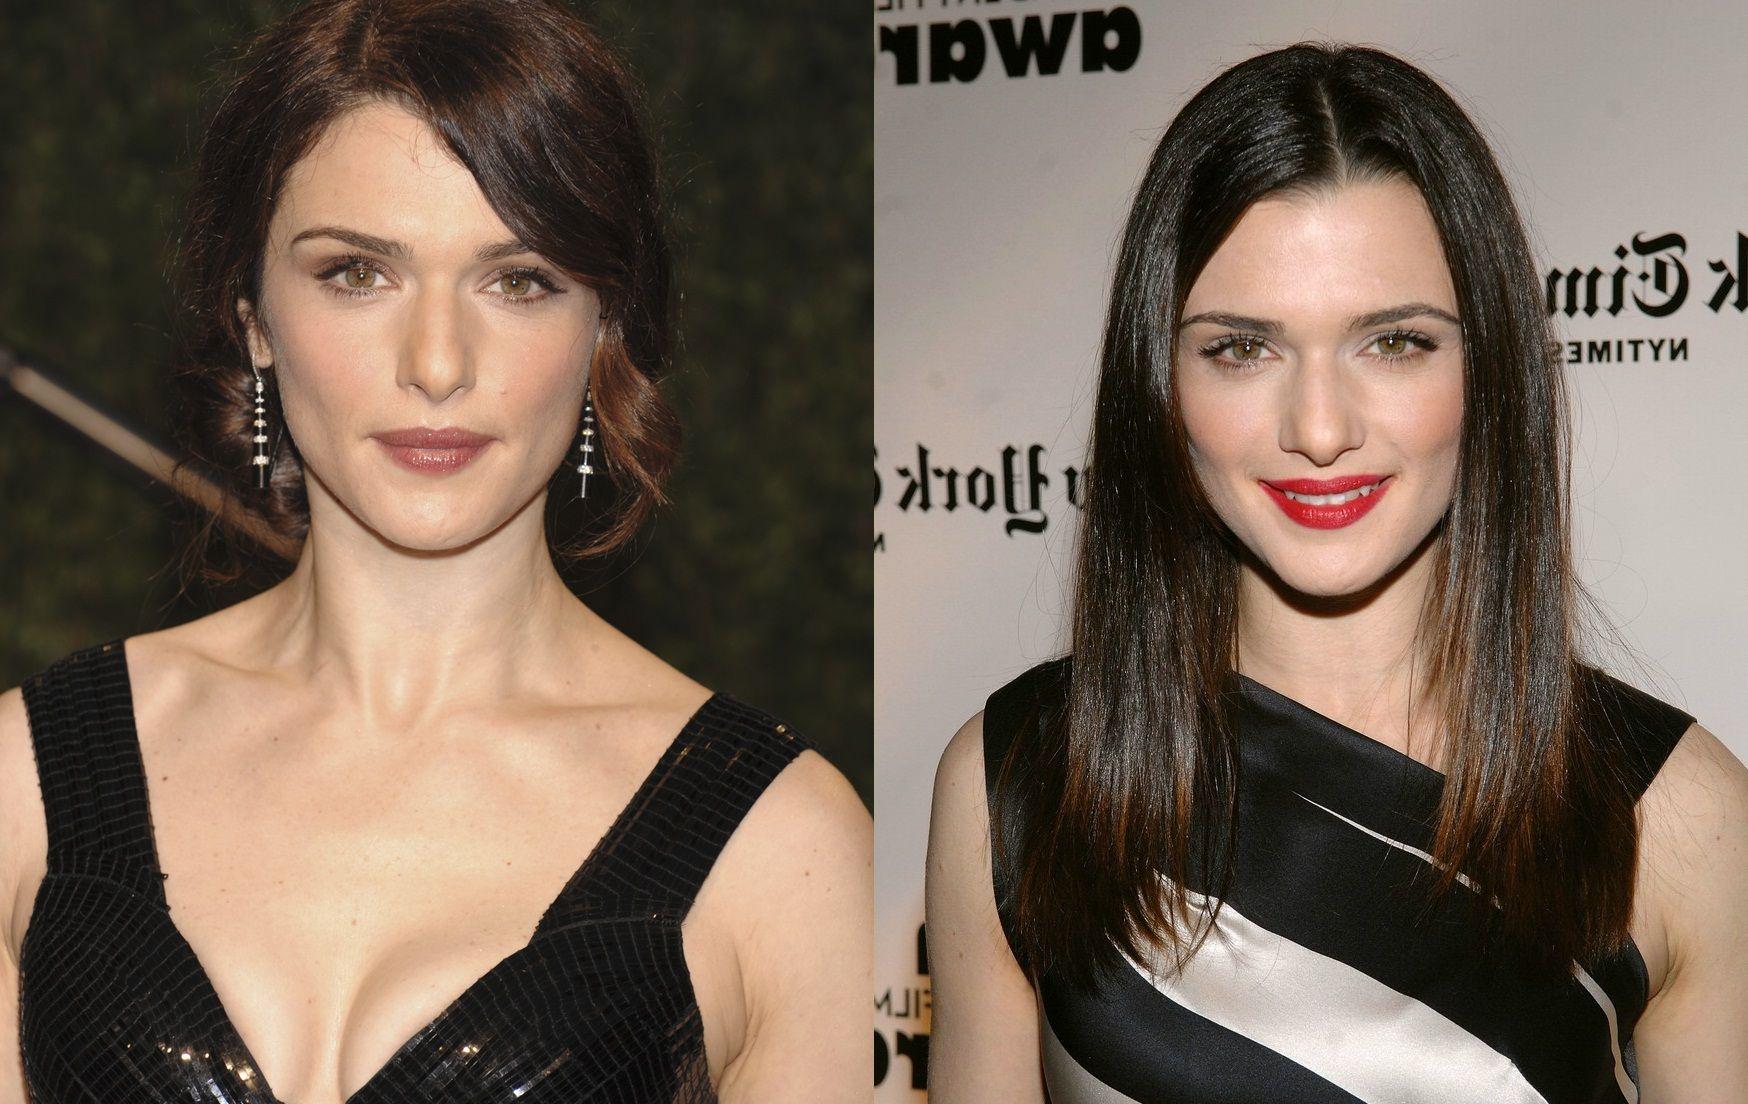 rachel weisz face lift plastic surgery before and after photos